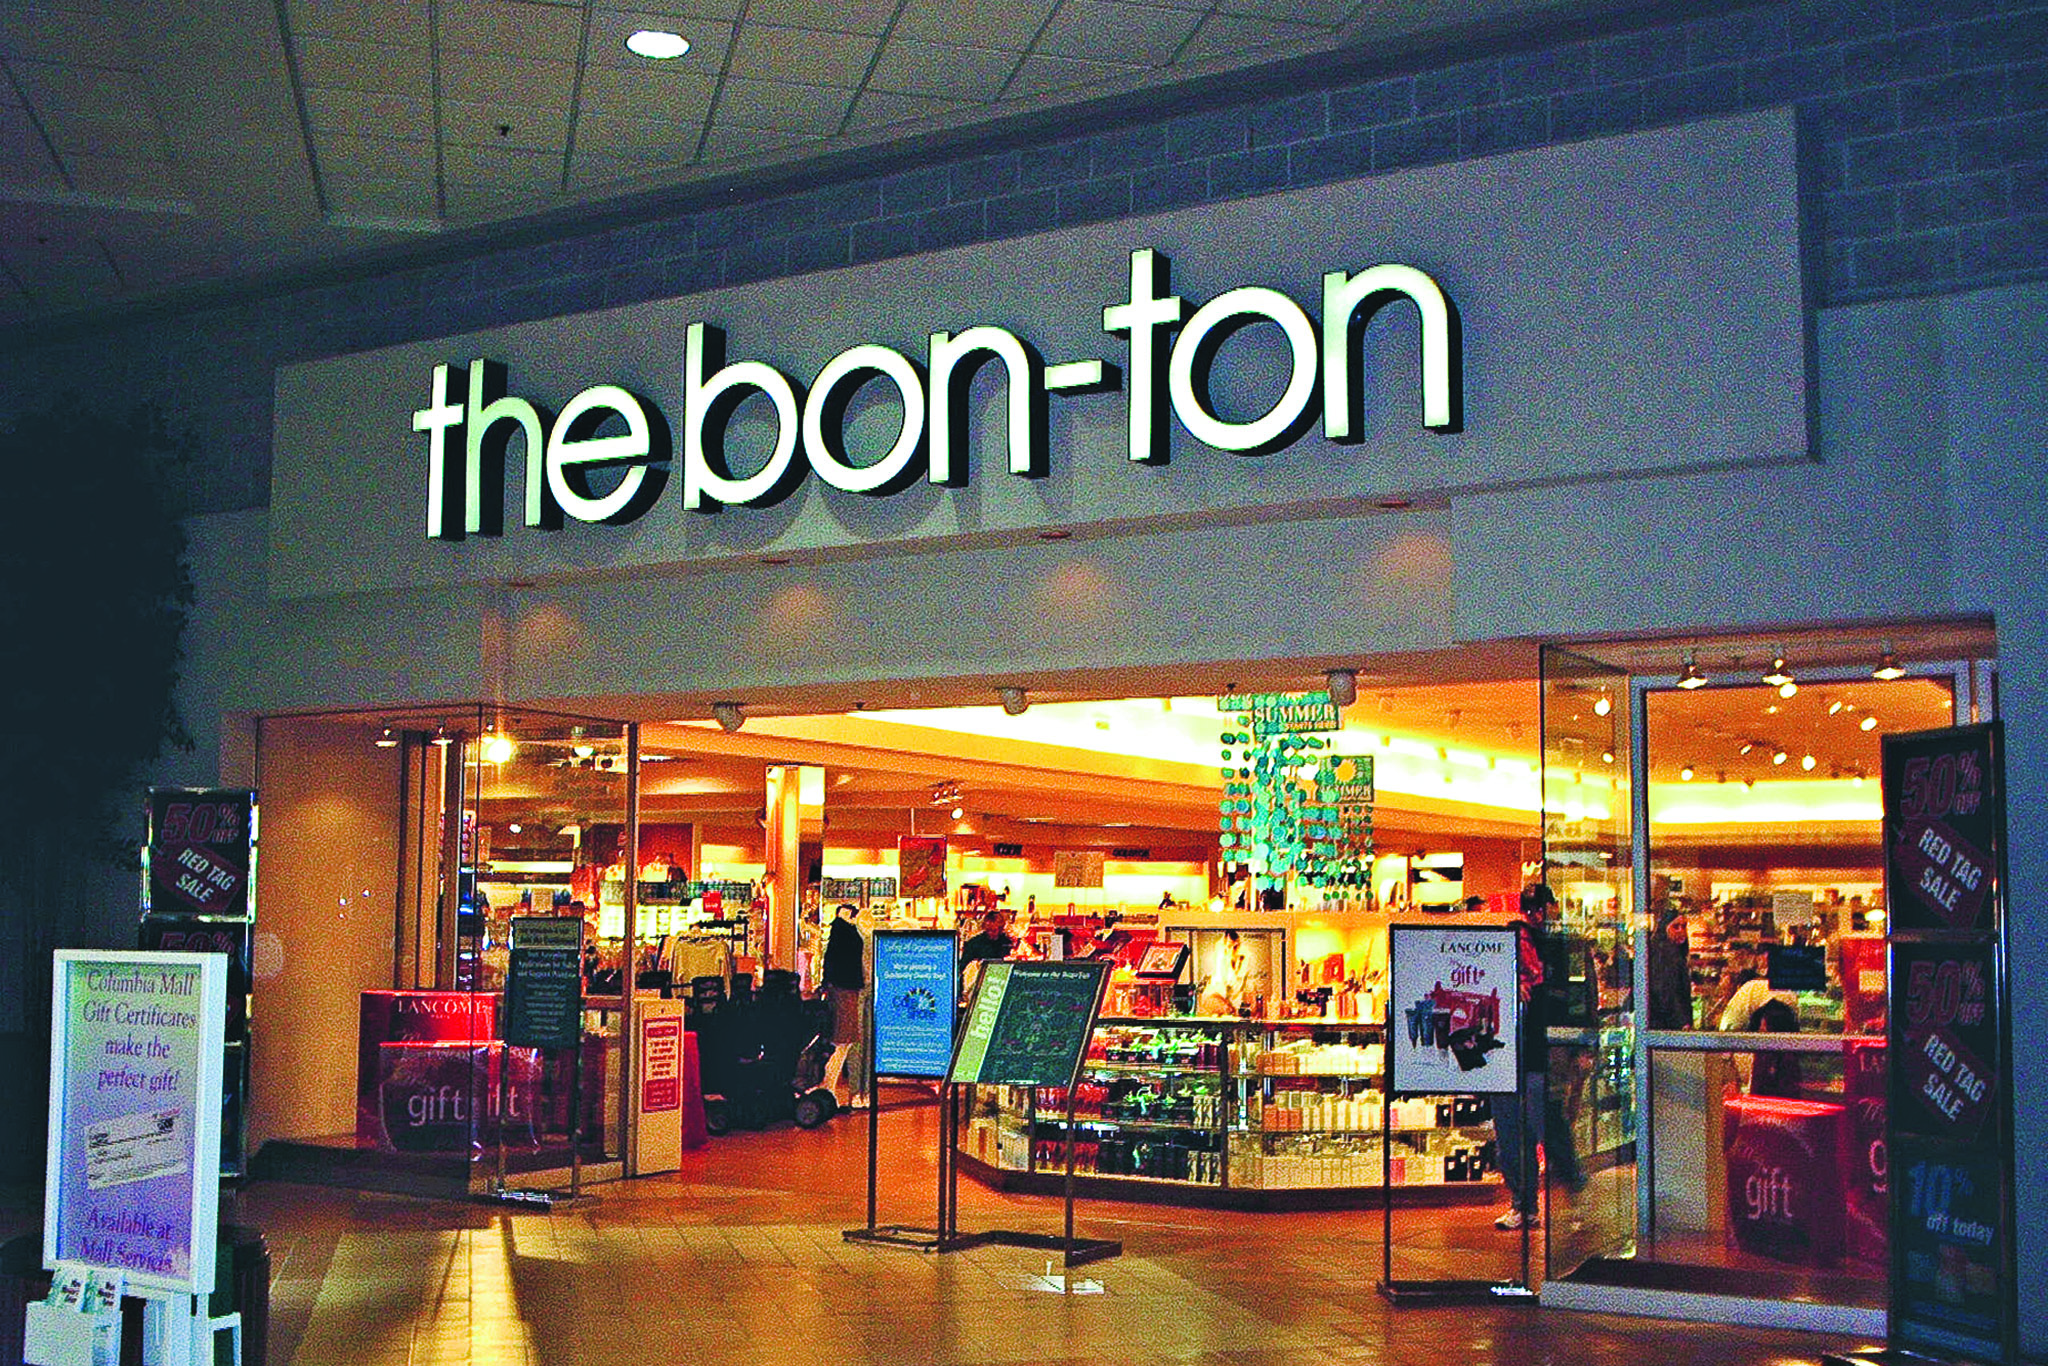 Exterior view of a Bon-Ton store